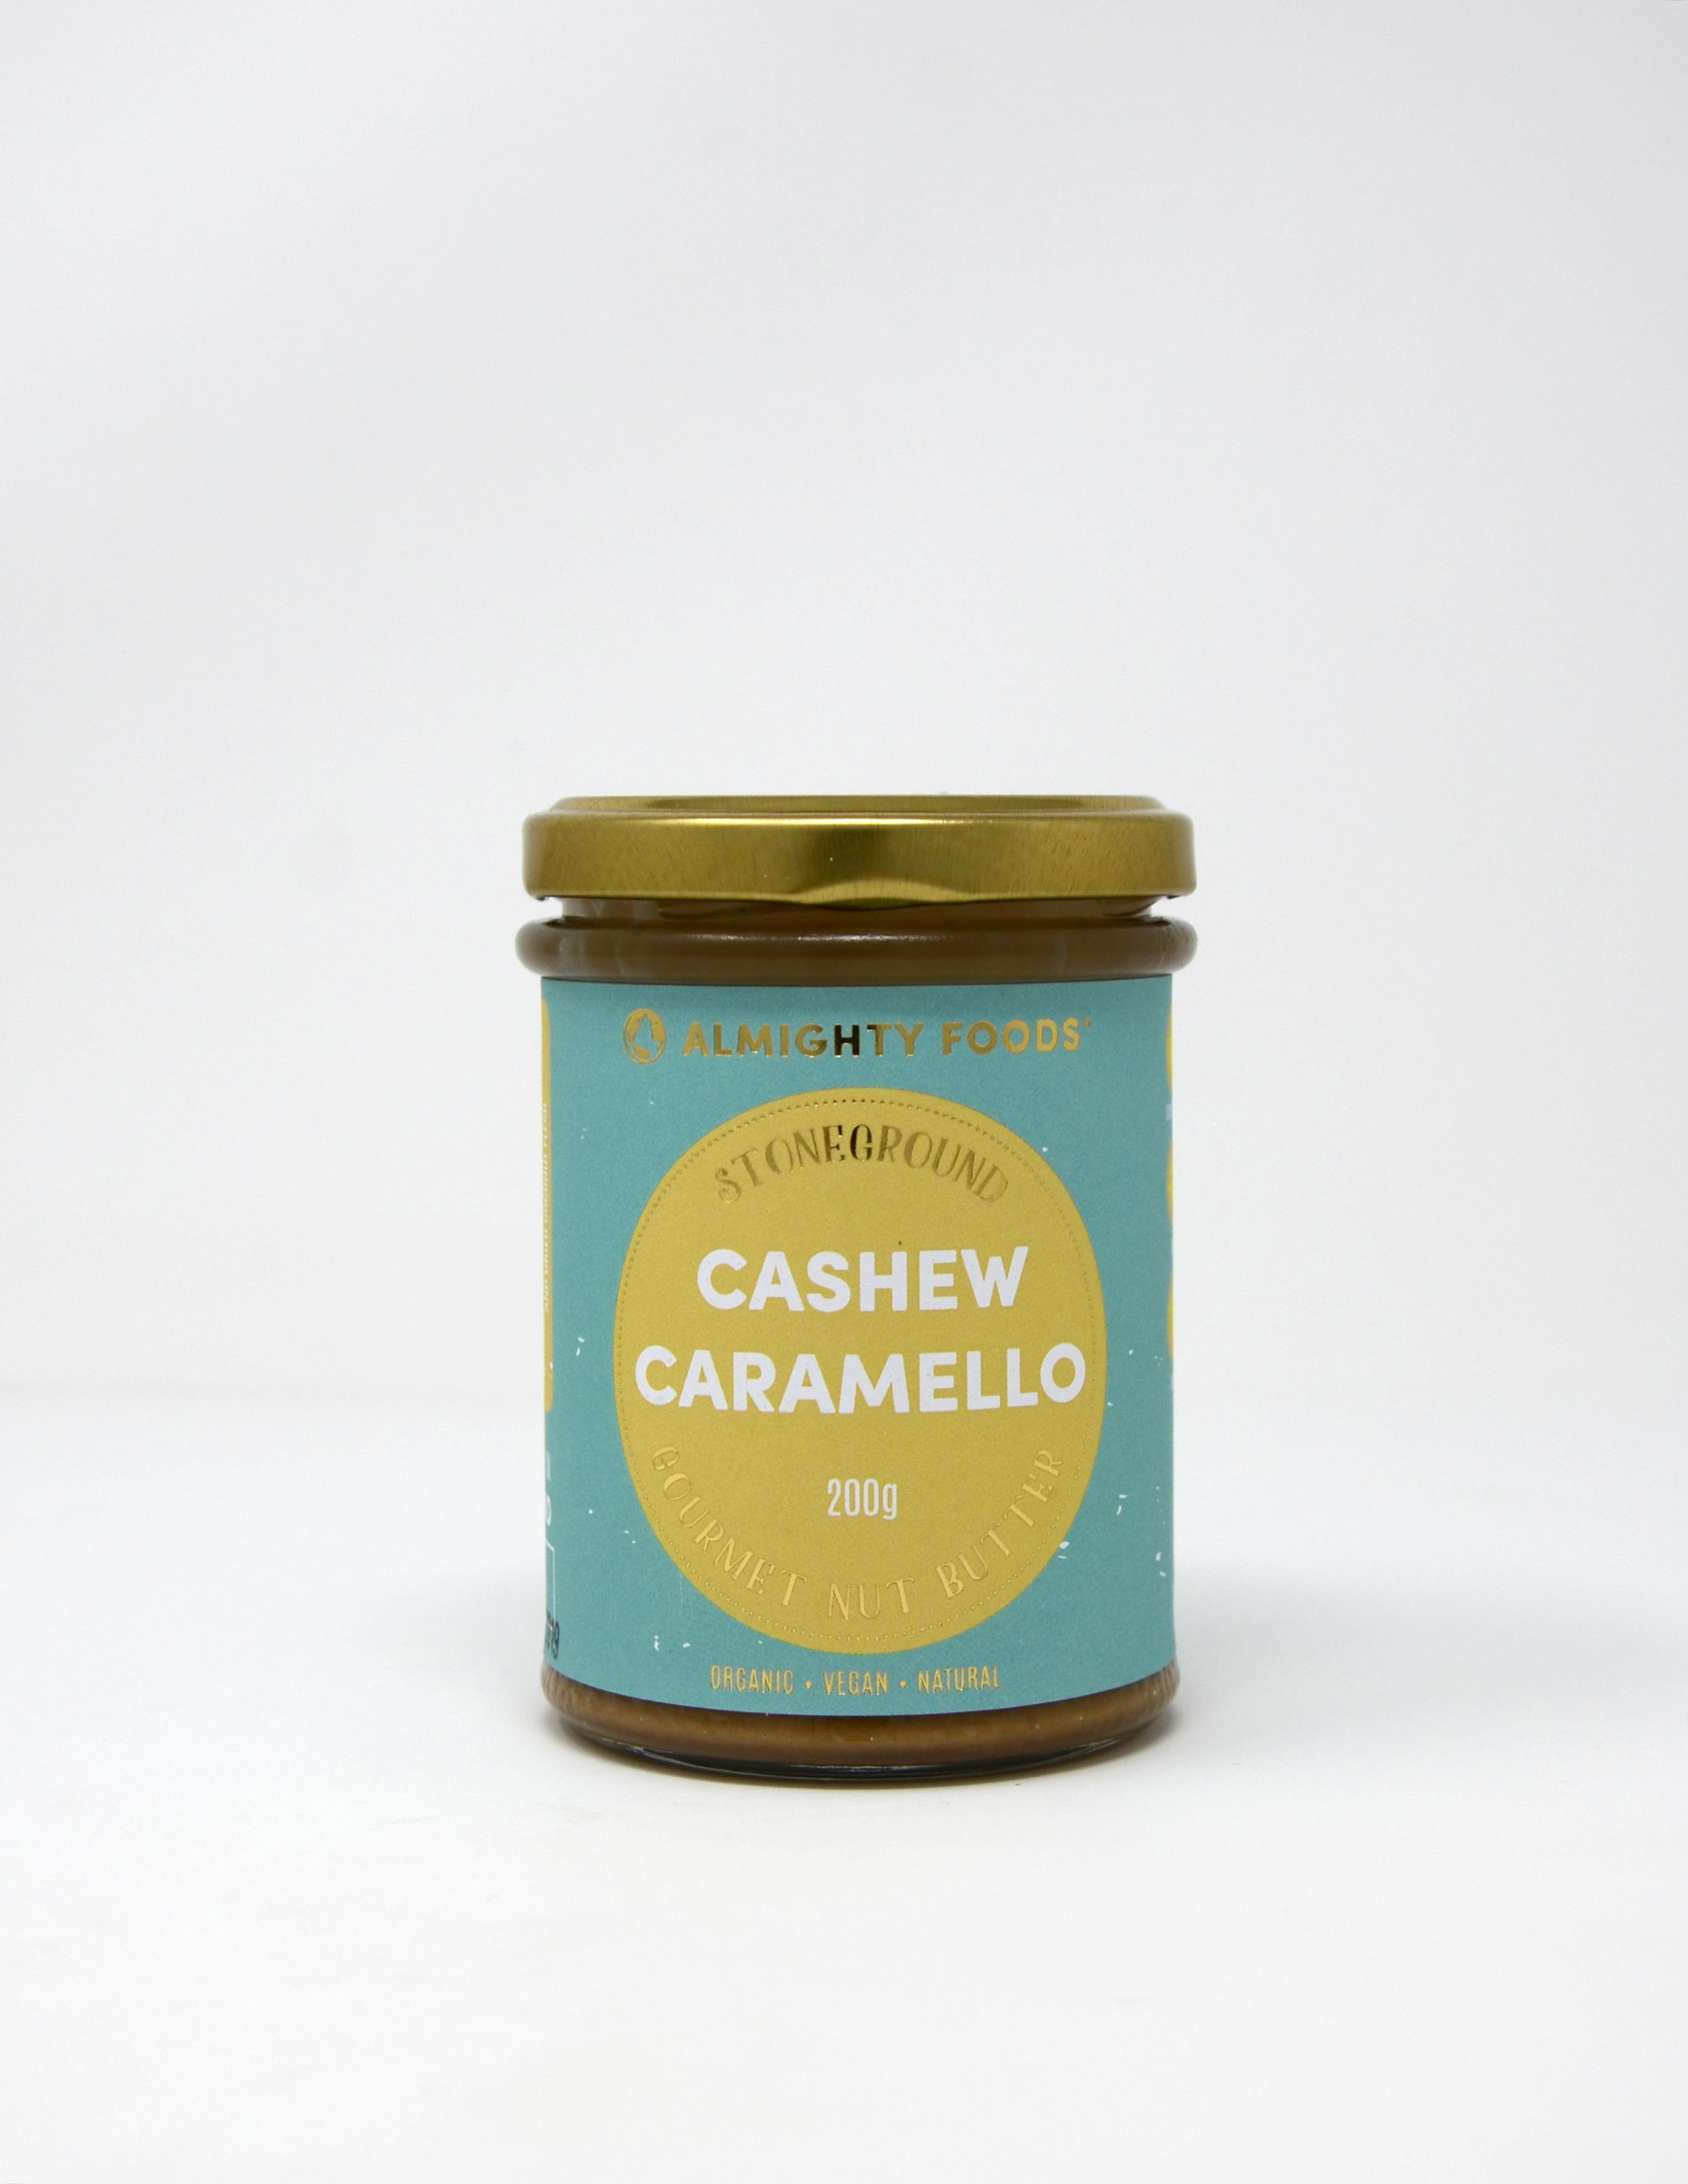 CASHEW CARAMELLO.jpg